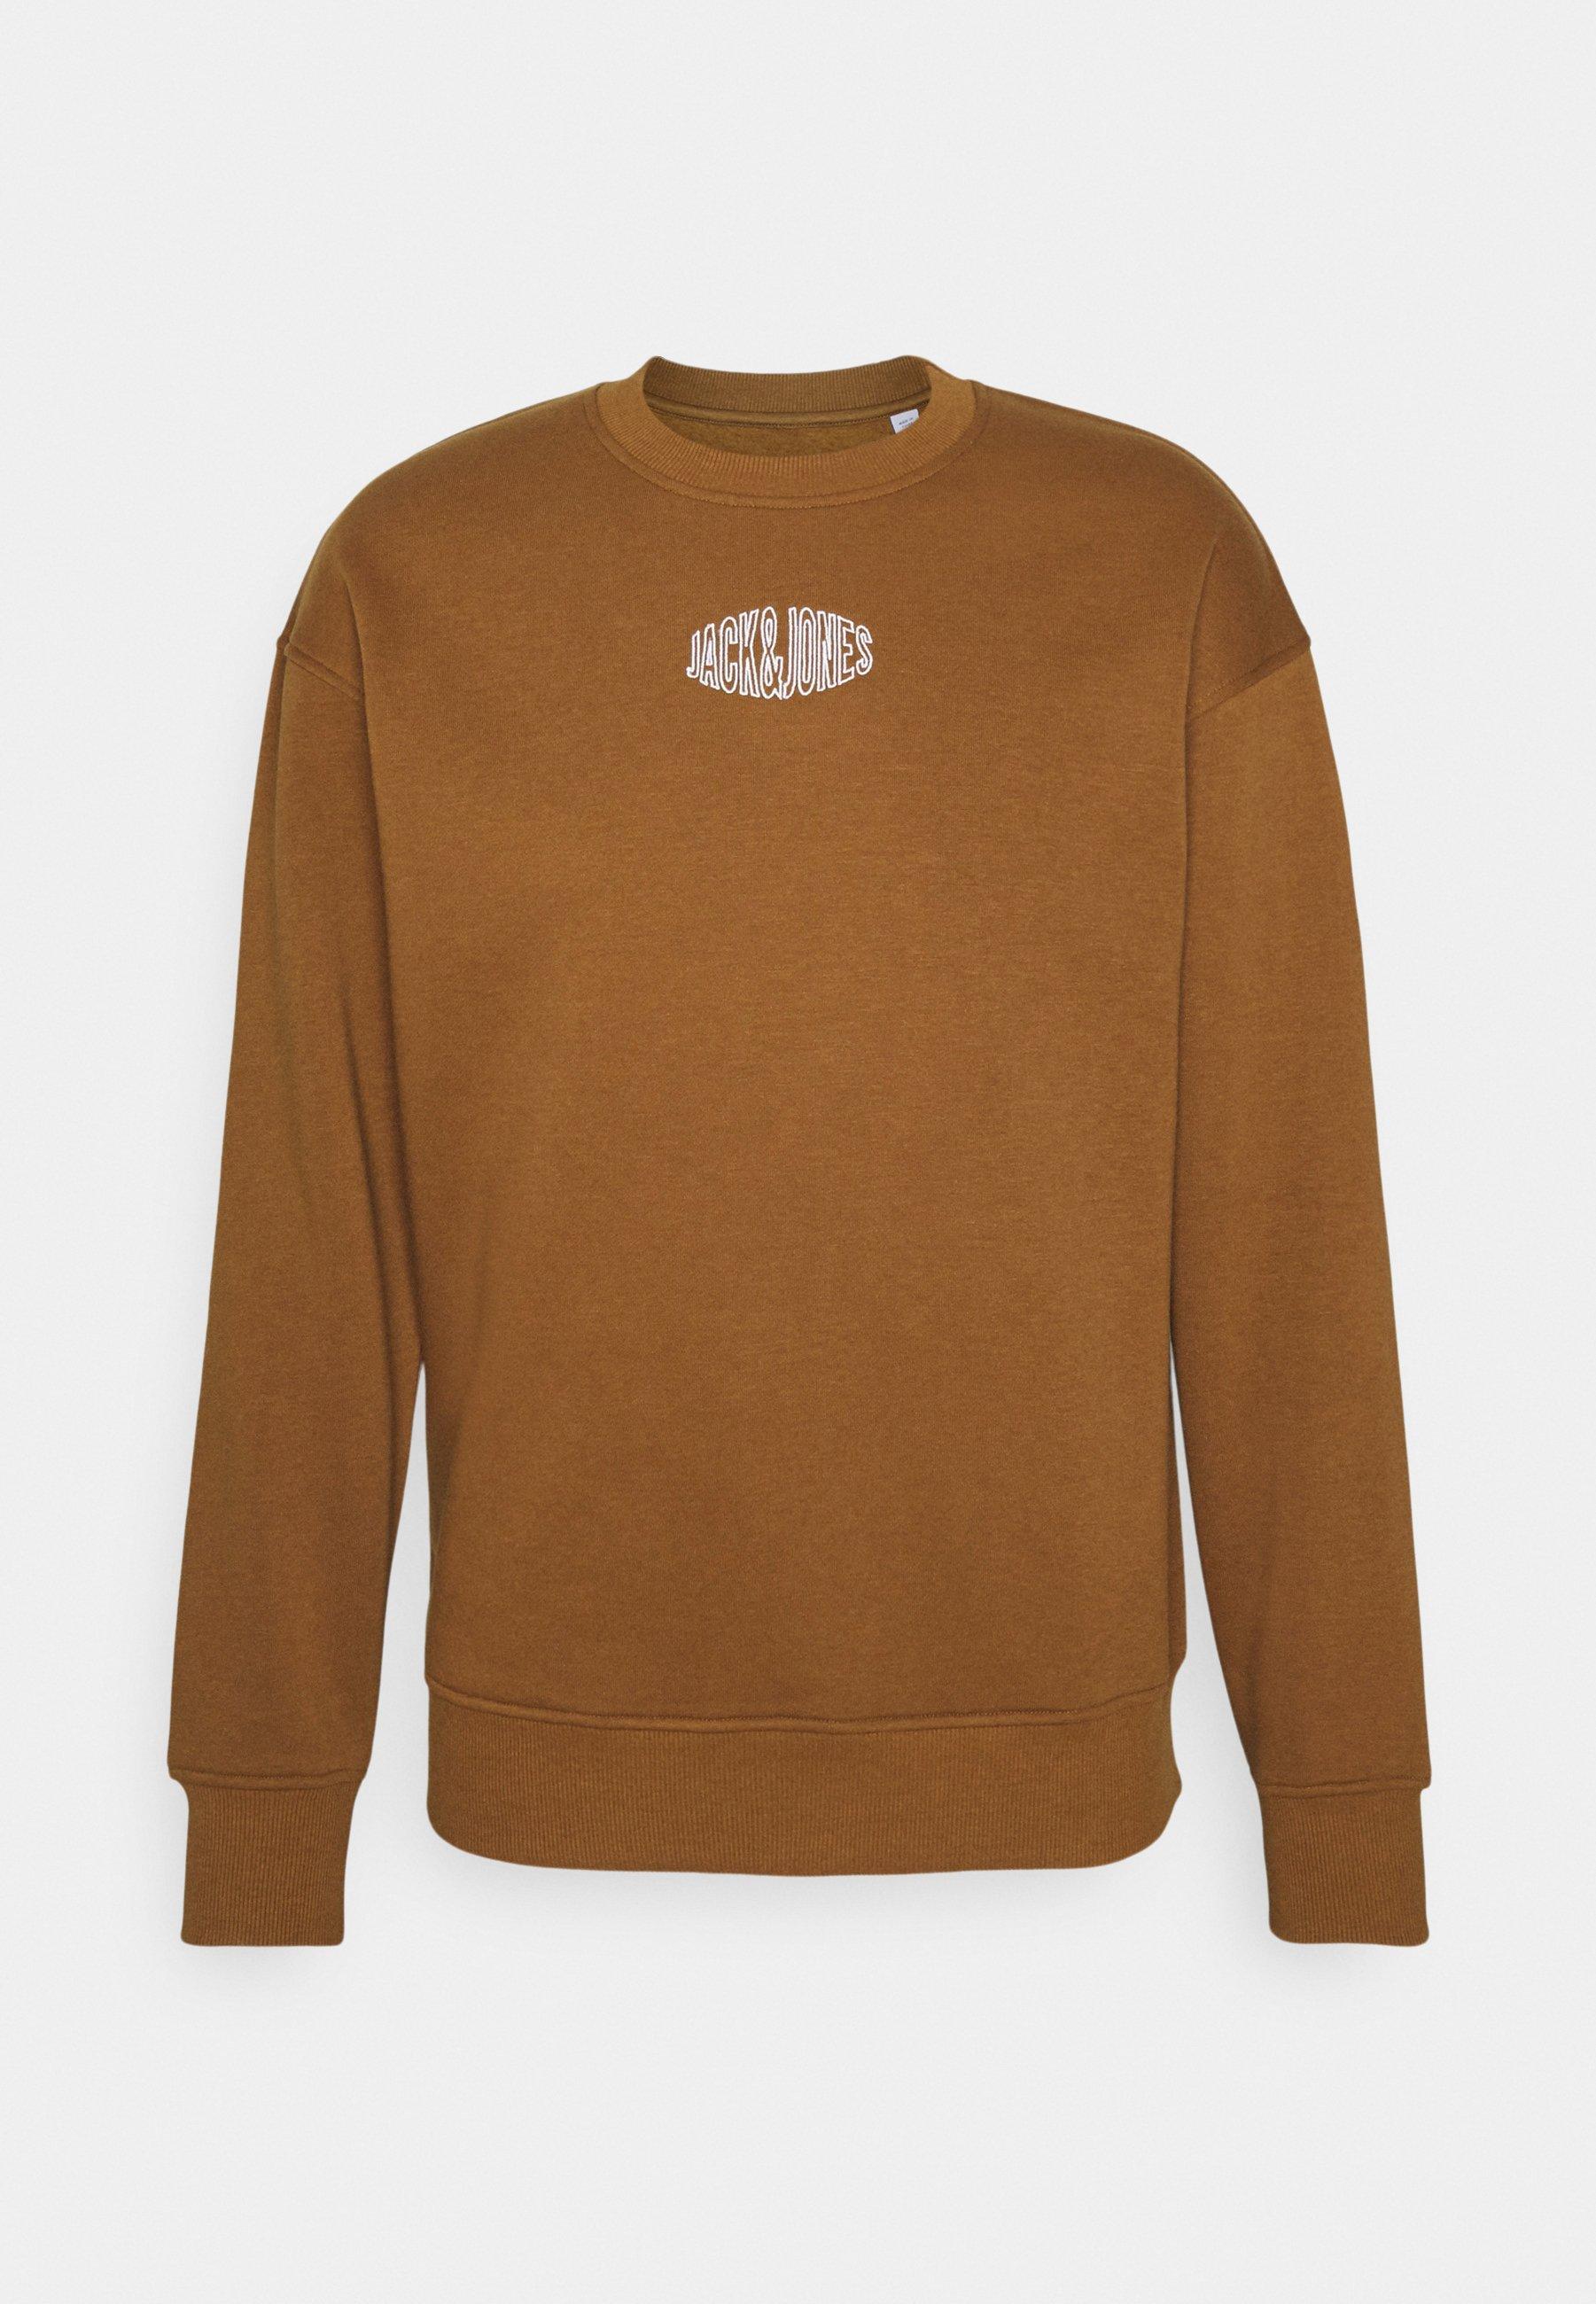 Homme JORWORLD CREW NECK - Sweatshirt